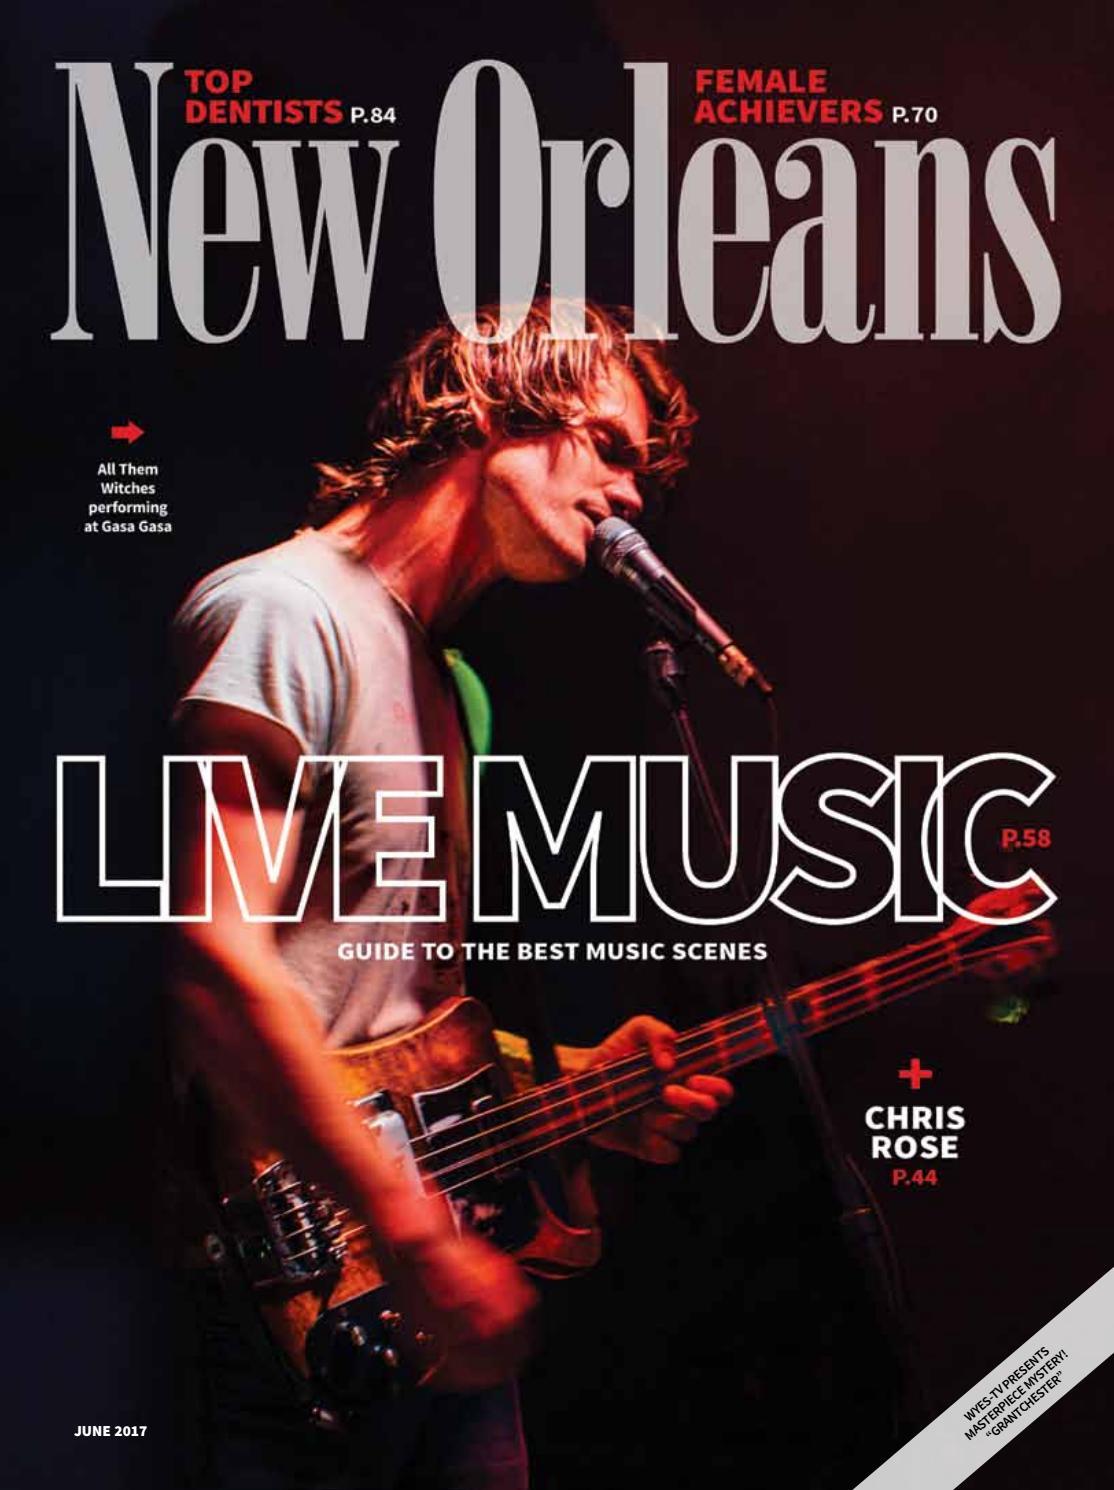 8c3464bfcf New Orleans Magazine June 2017 by Renaissance Publishing - issuu